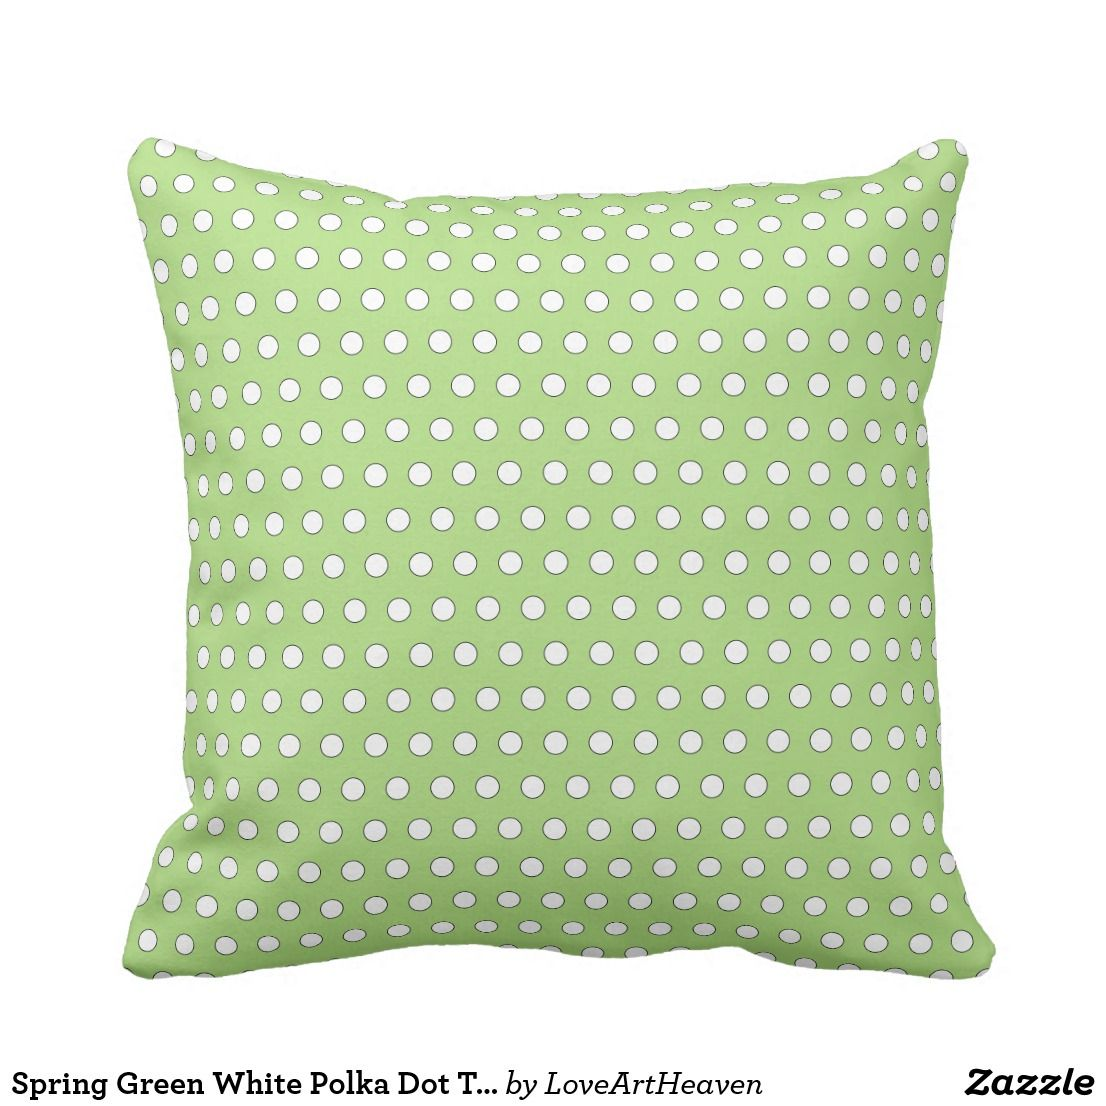 Outstanding Spring Green White Polka Dot Throw Pillow Zazzle Home Machost Co Dining Chair Design Ideas Machostcouk